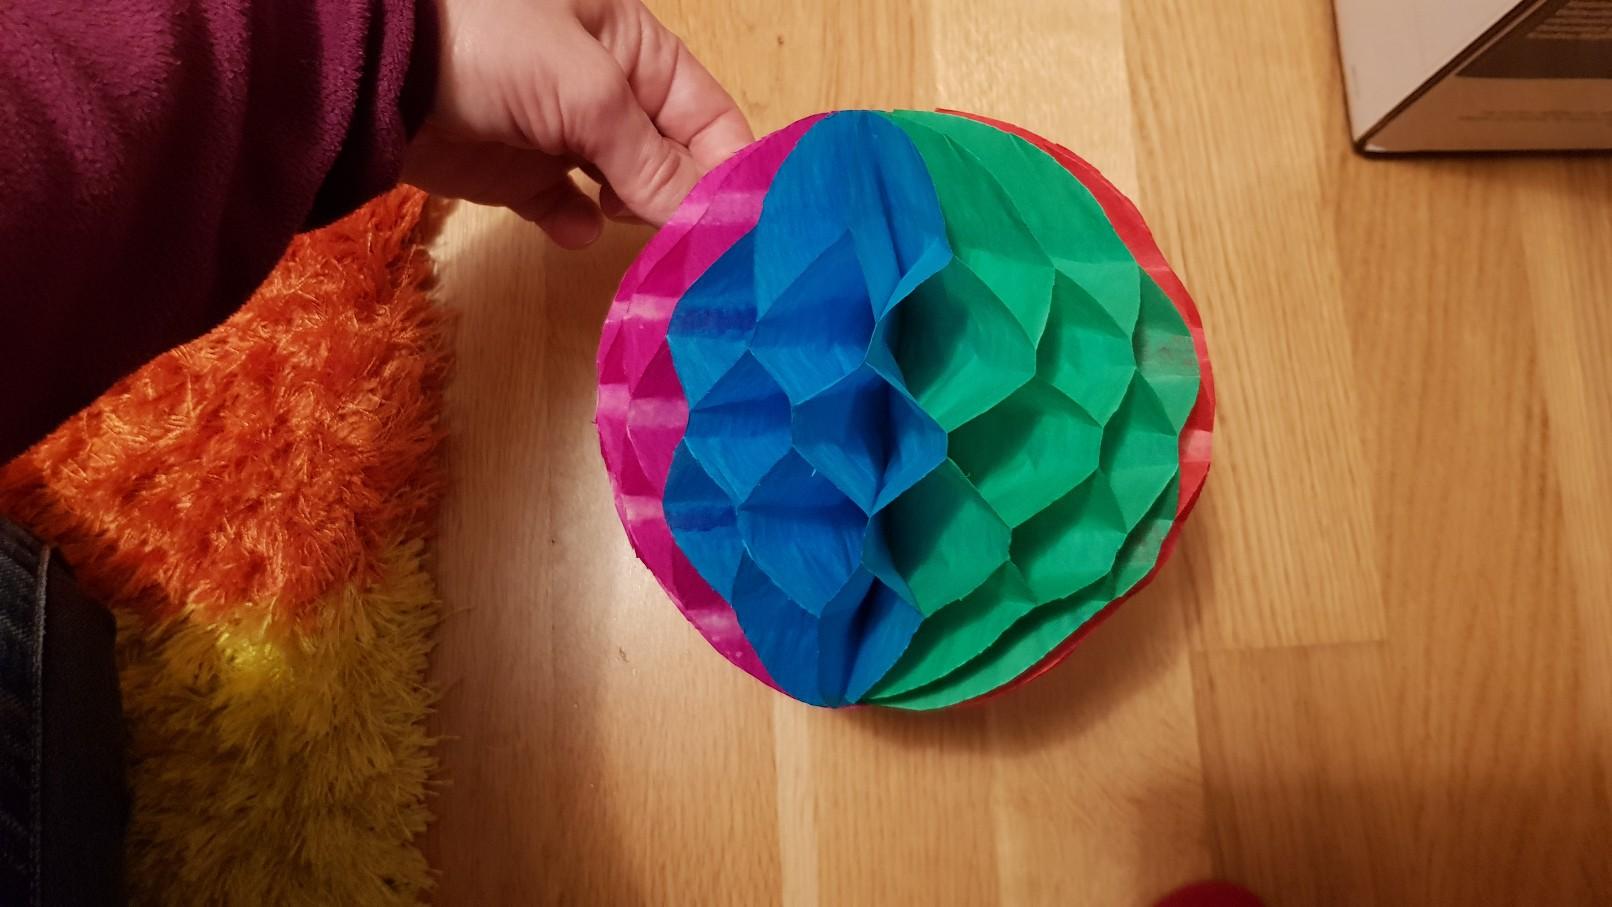 honeycomb ball full